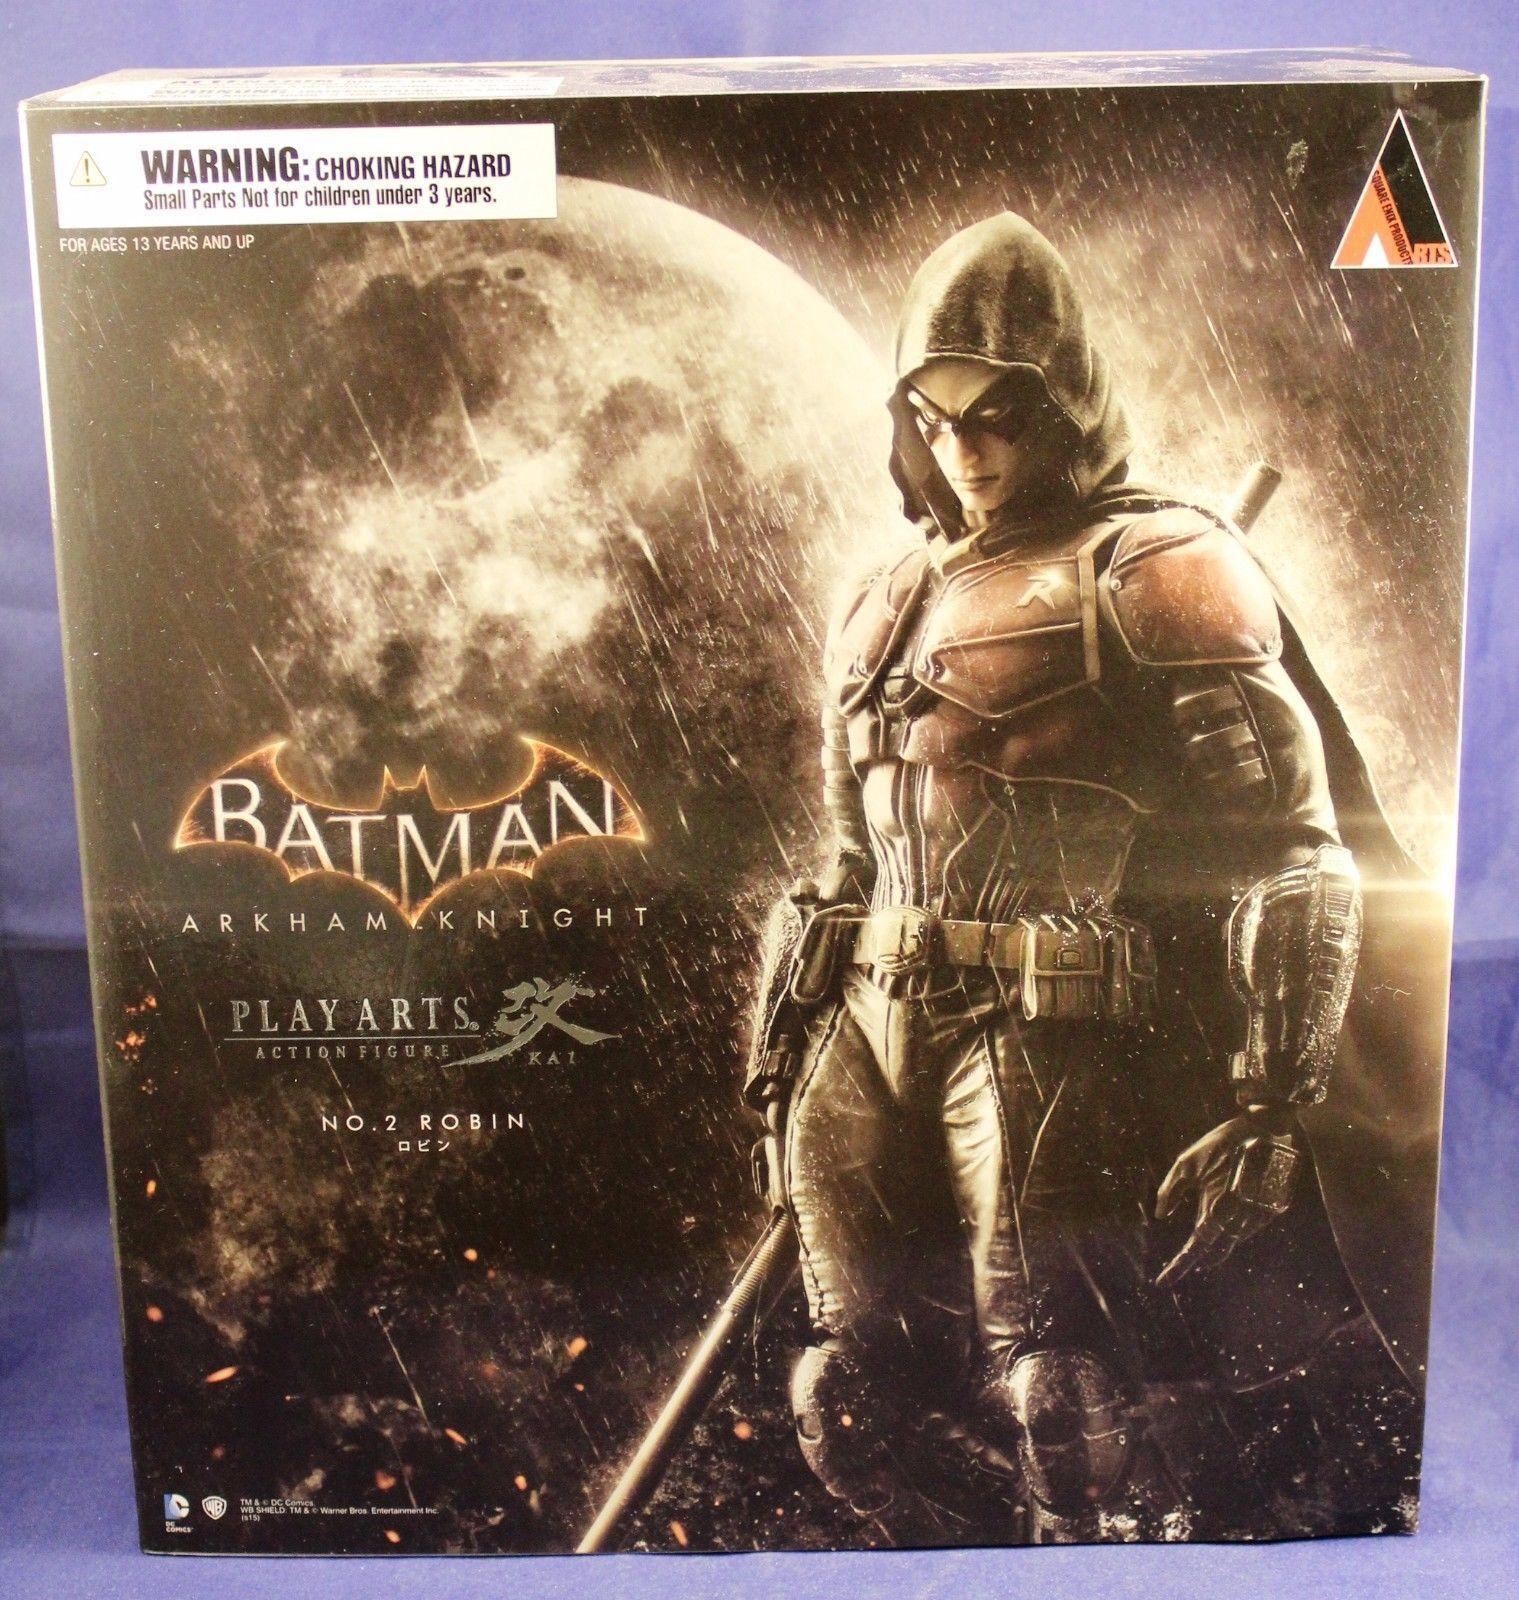 Batman arkham ritter spielen kunst kai robin actionfigur square enix nr. 2